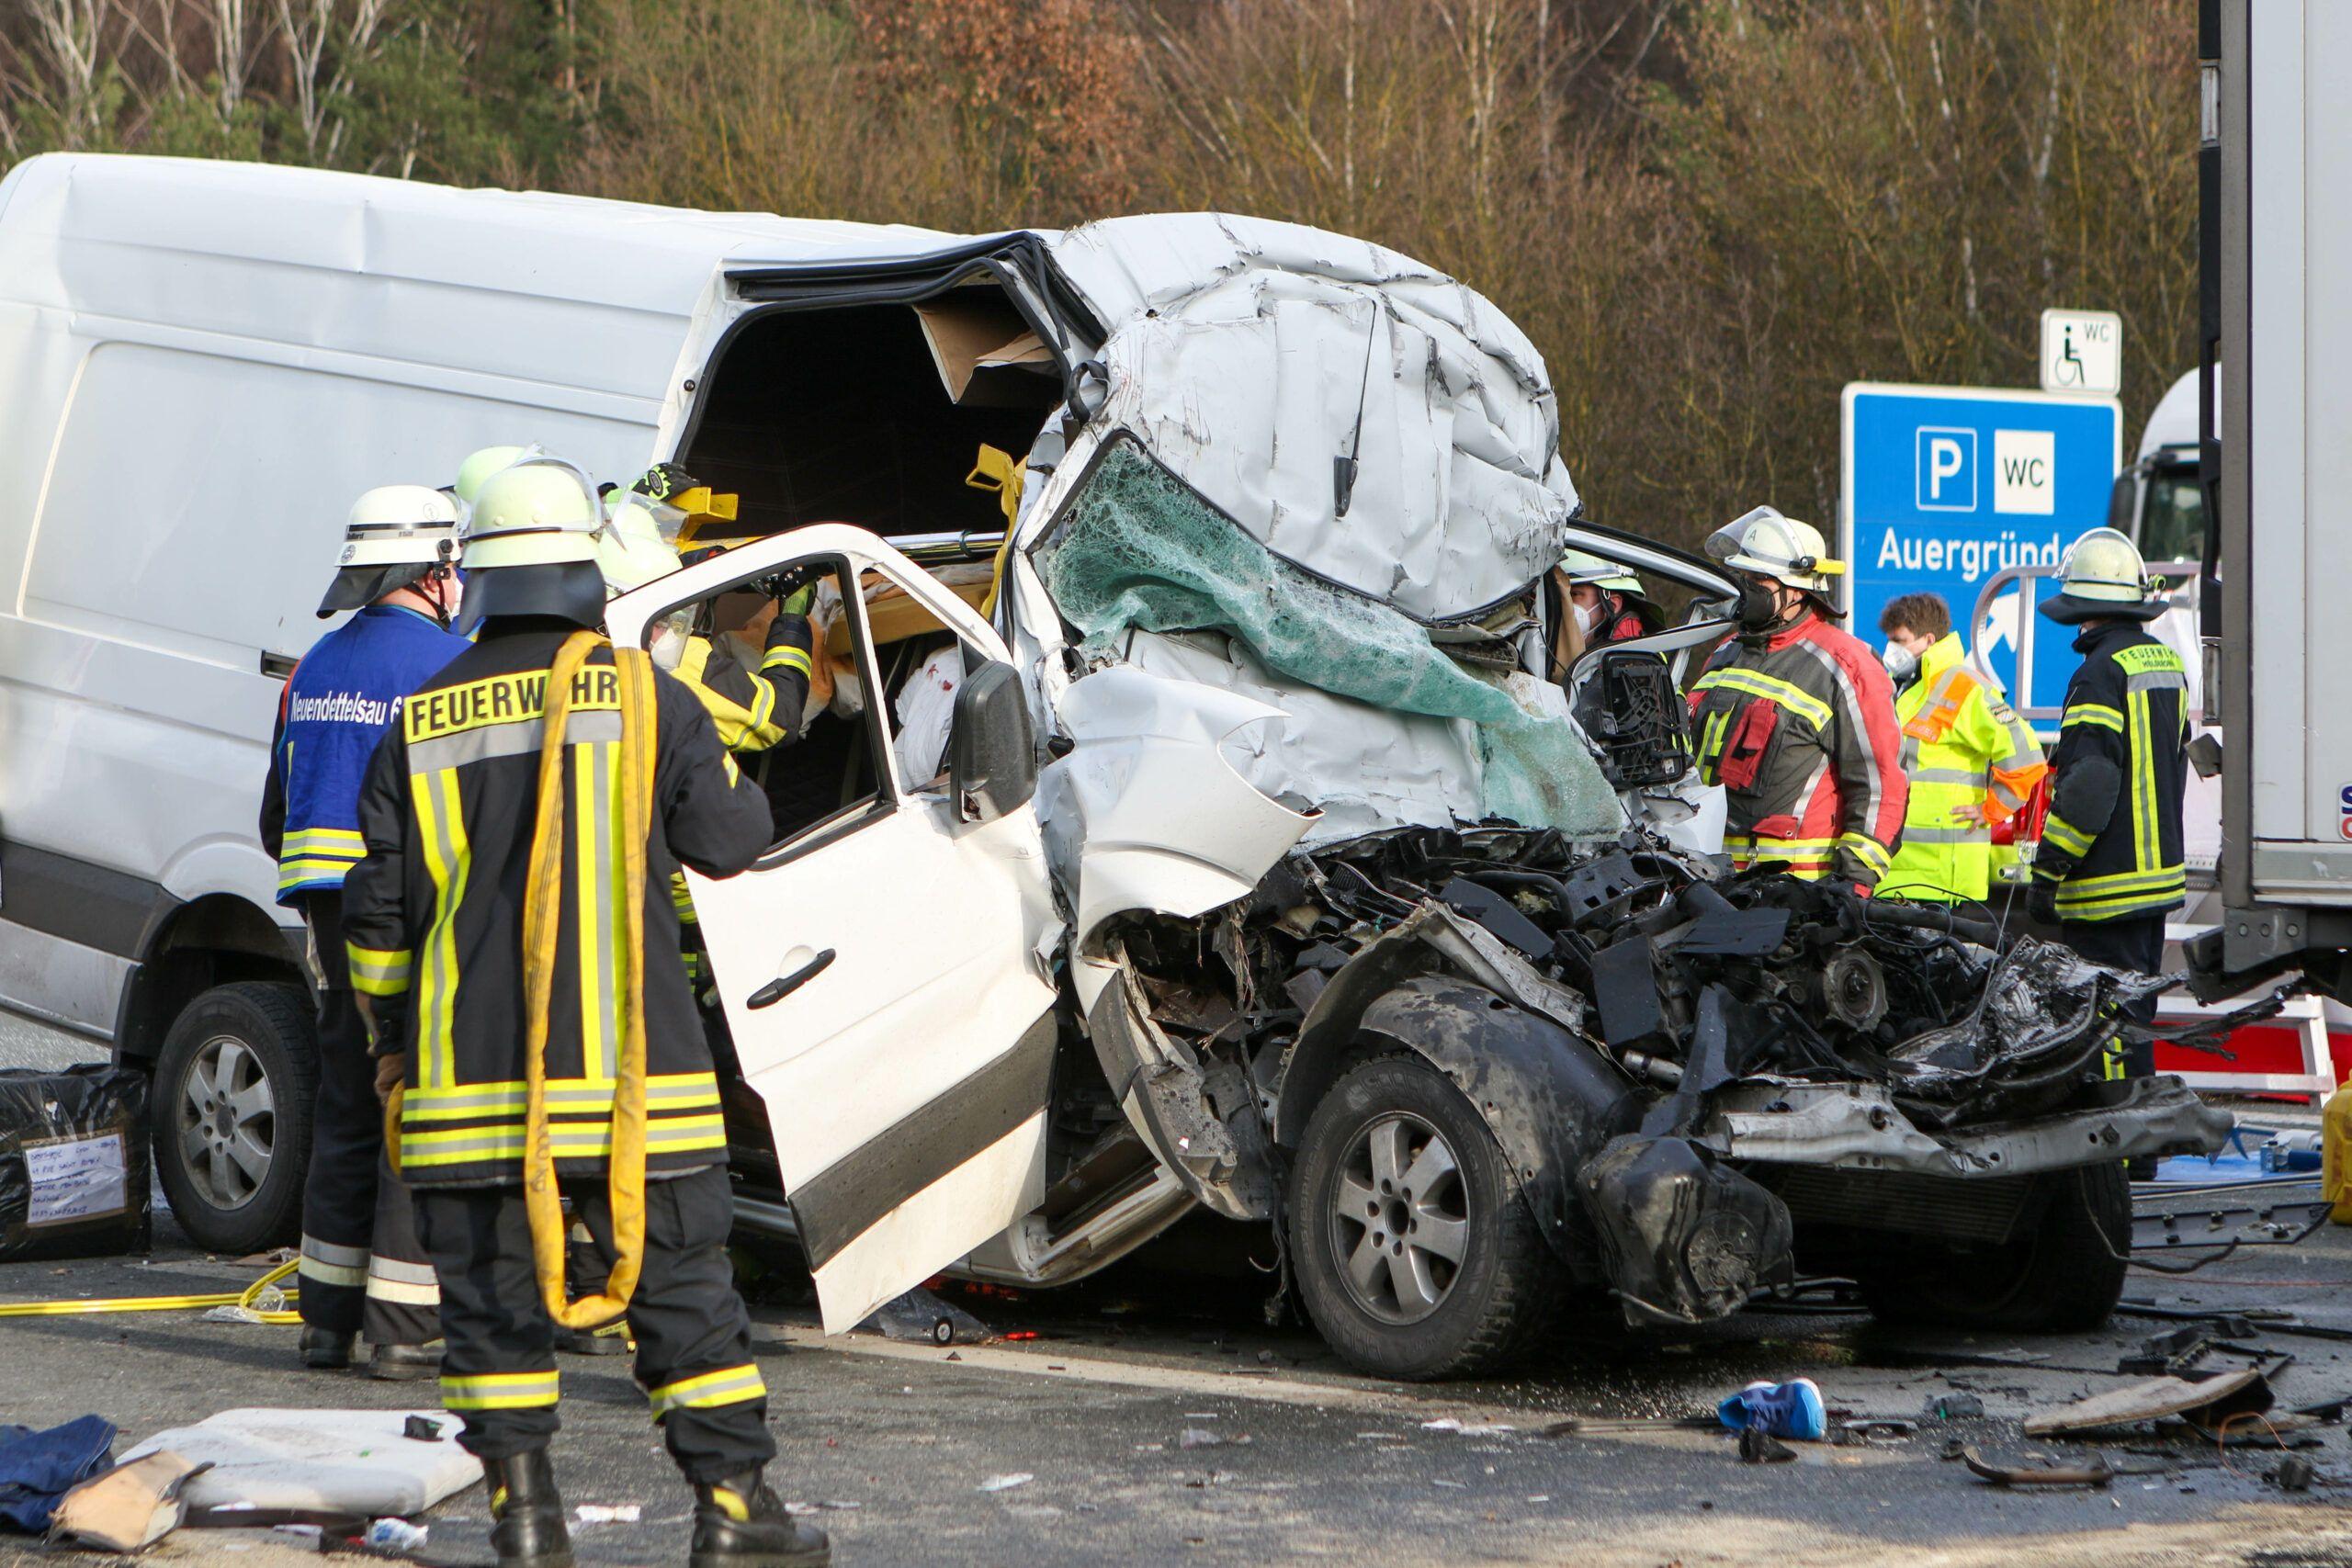 210325 Vifogra Unfall A6 Neuendettelsau 11 Scaled